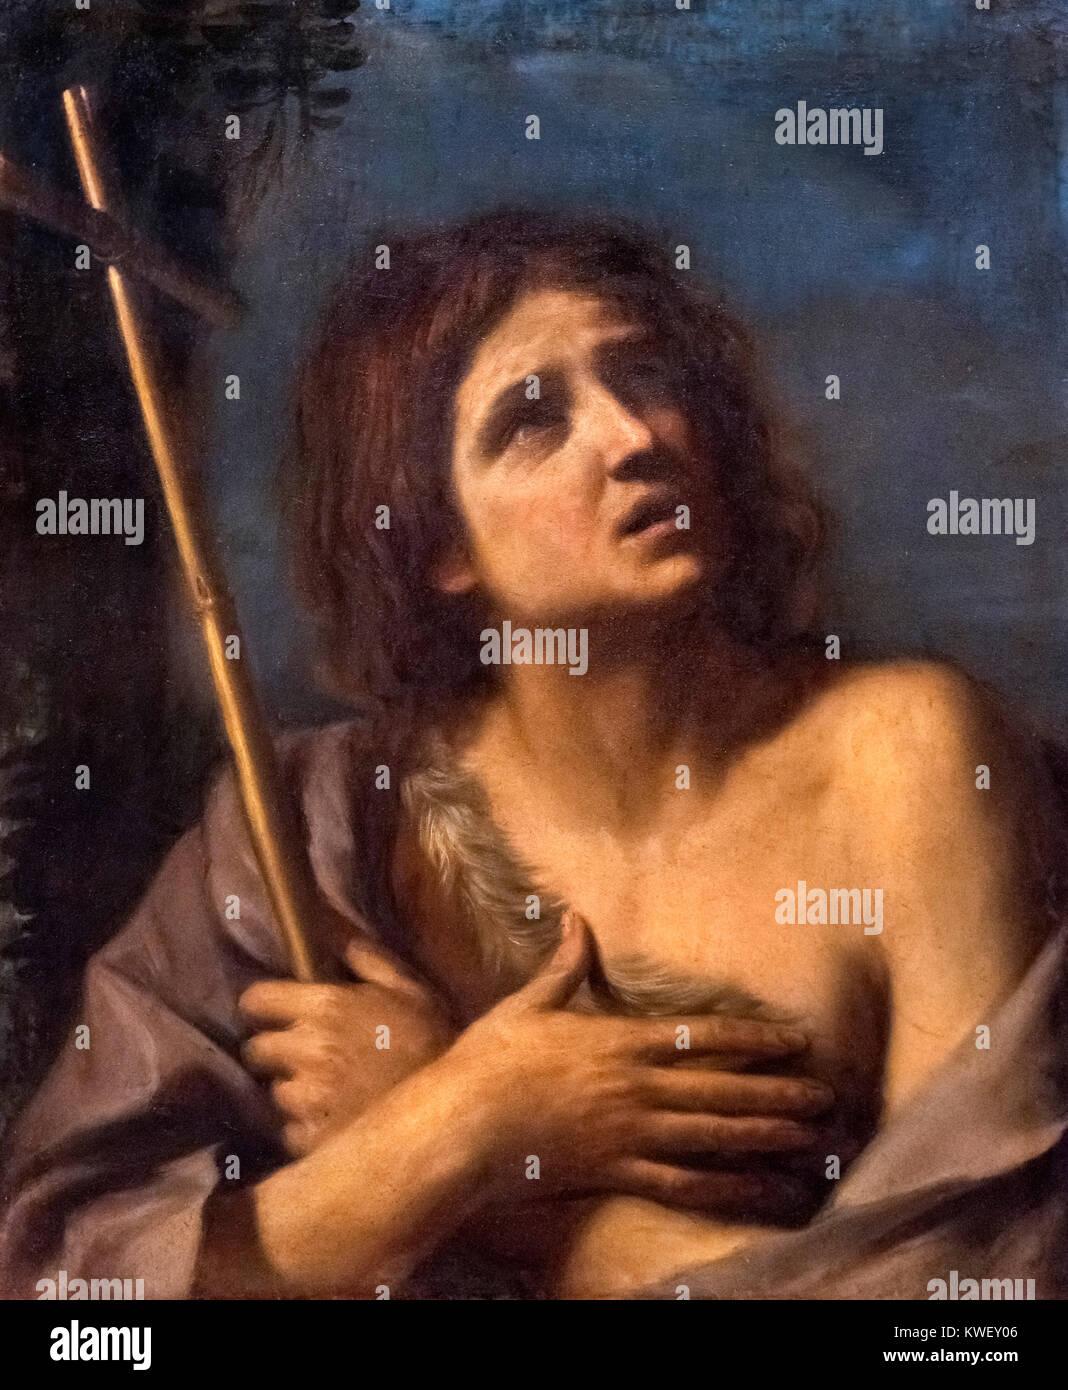 St John the Baptist by Il Guercino (Giovanni Francesco Barbieri, 1591-1666), oil on canvas, - Stock Image